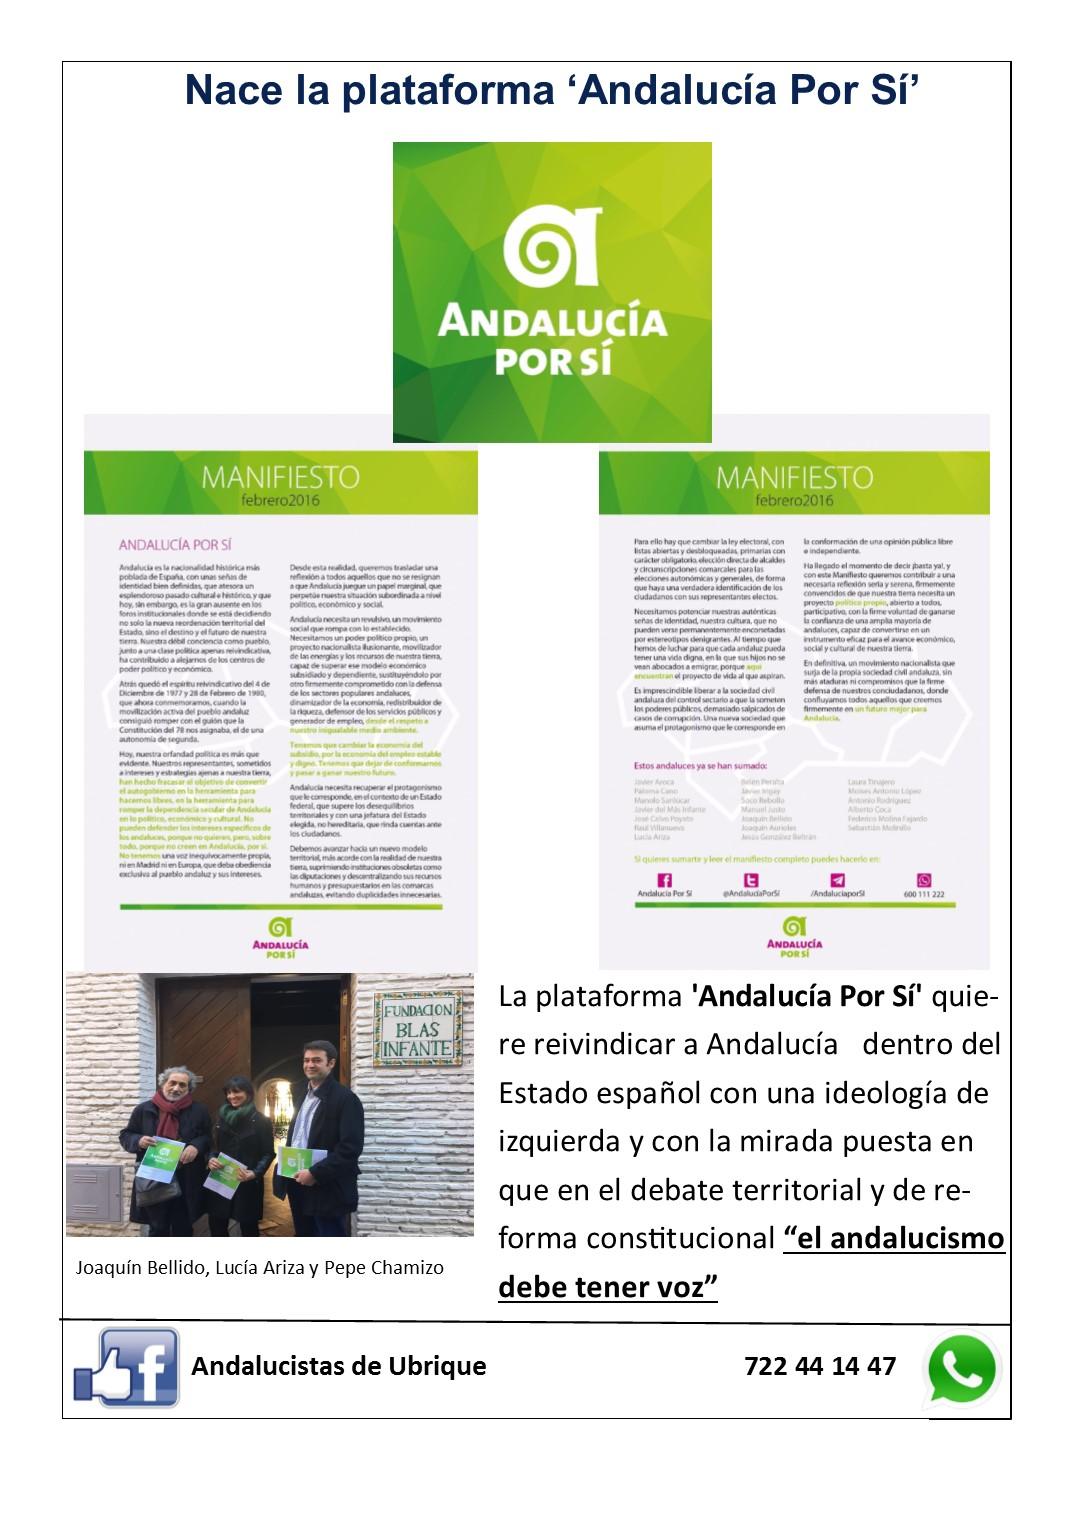 Photo of Boletín Ubrique Andalucista nº 2 (12 Mar. 2016)